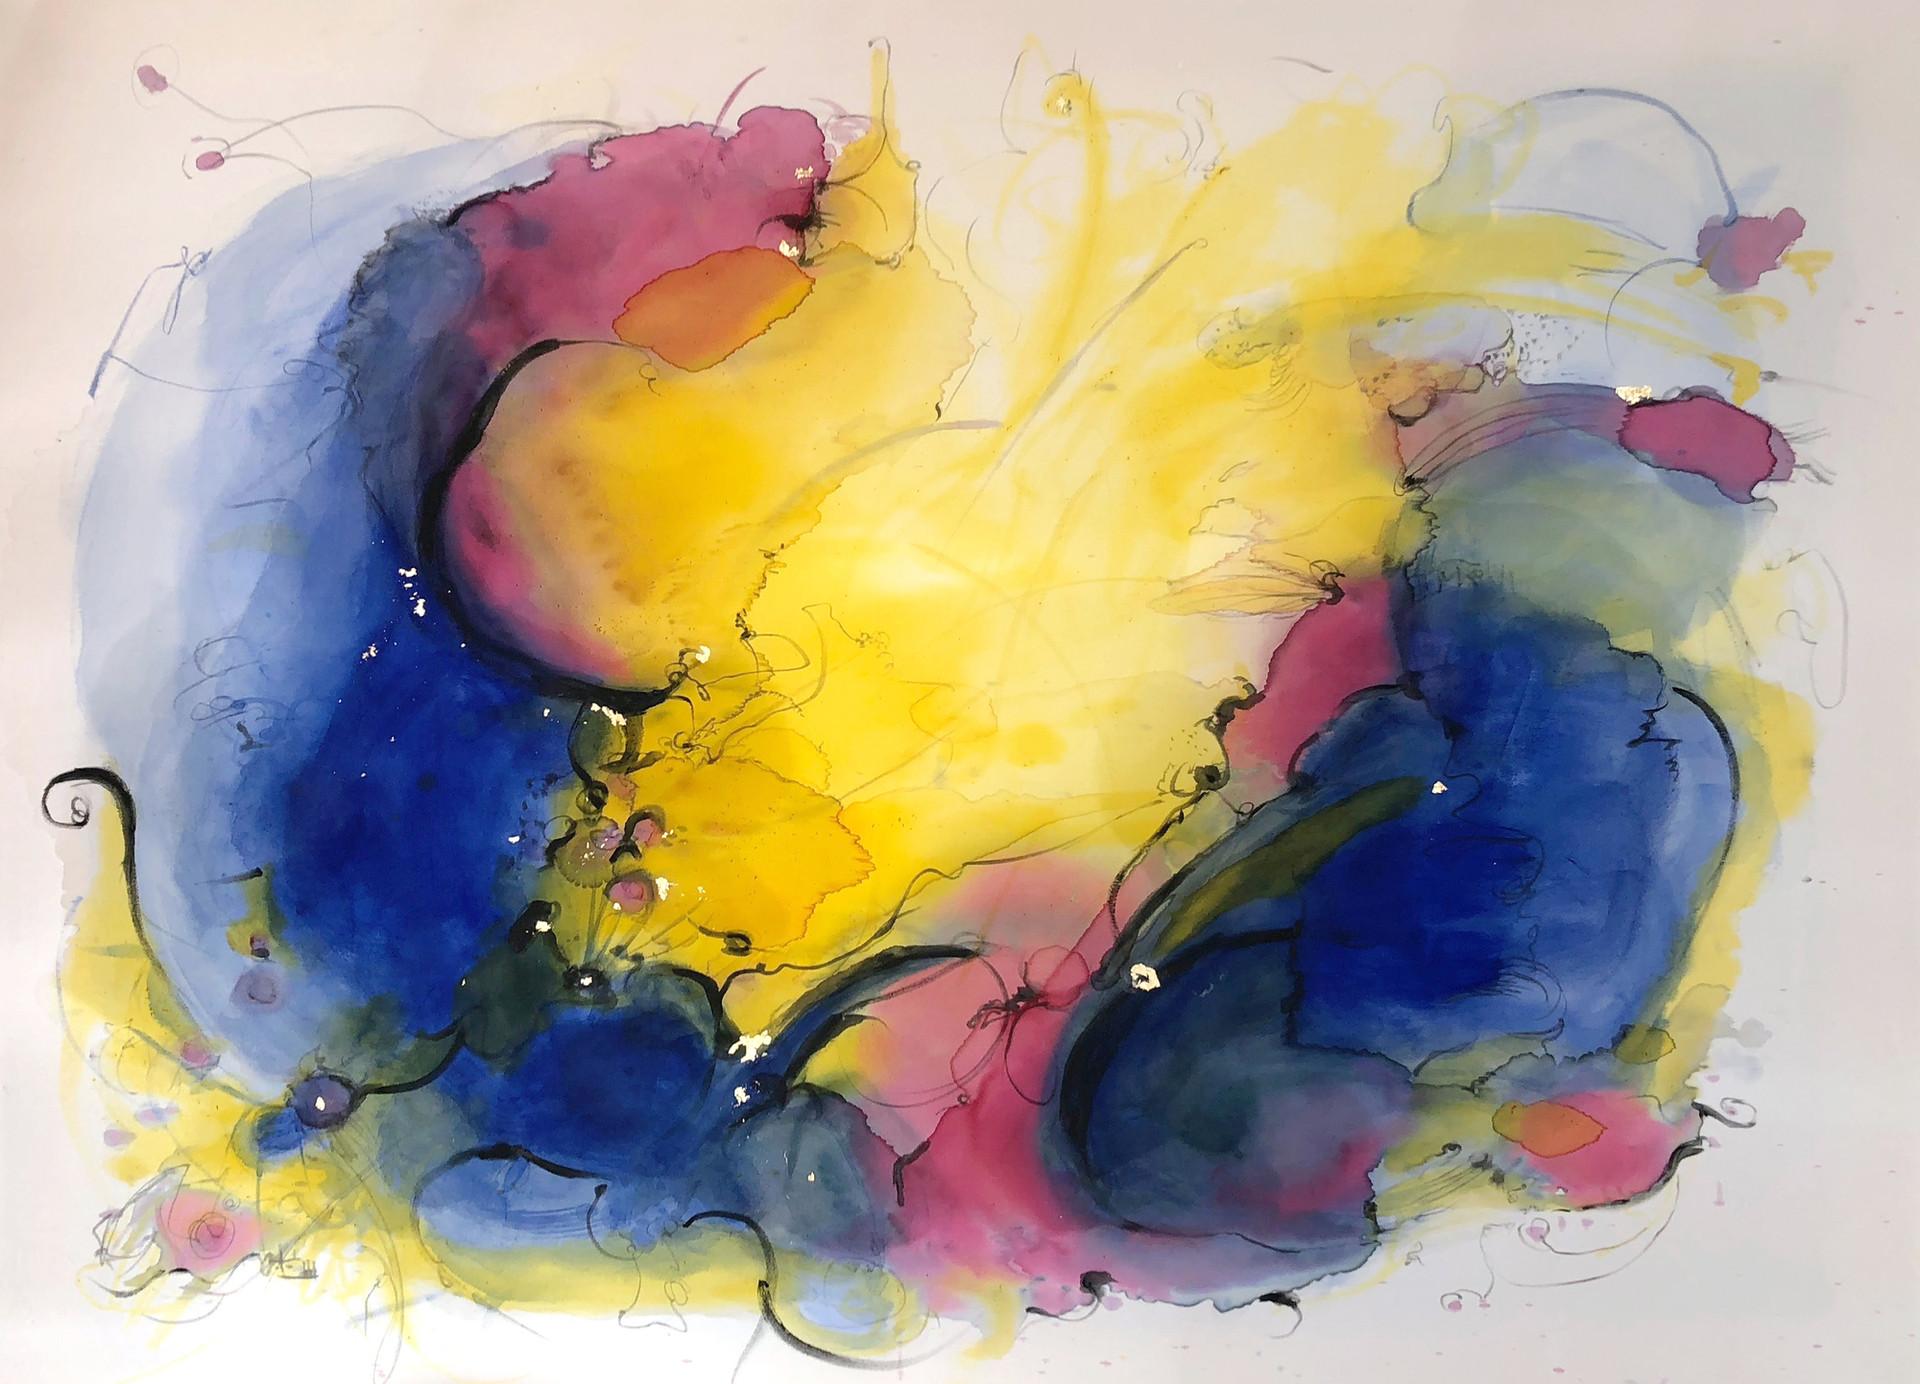 Prefume of Colors